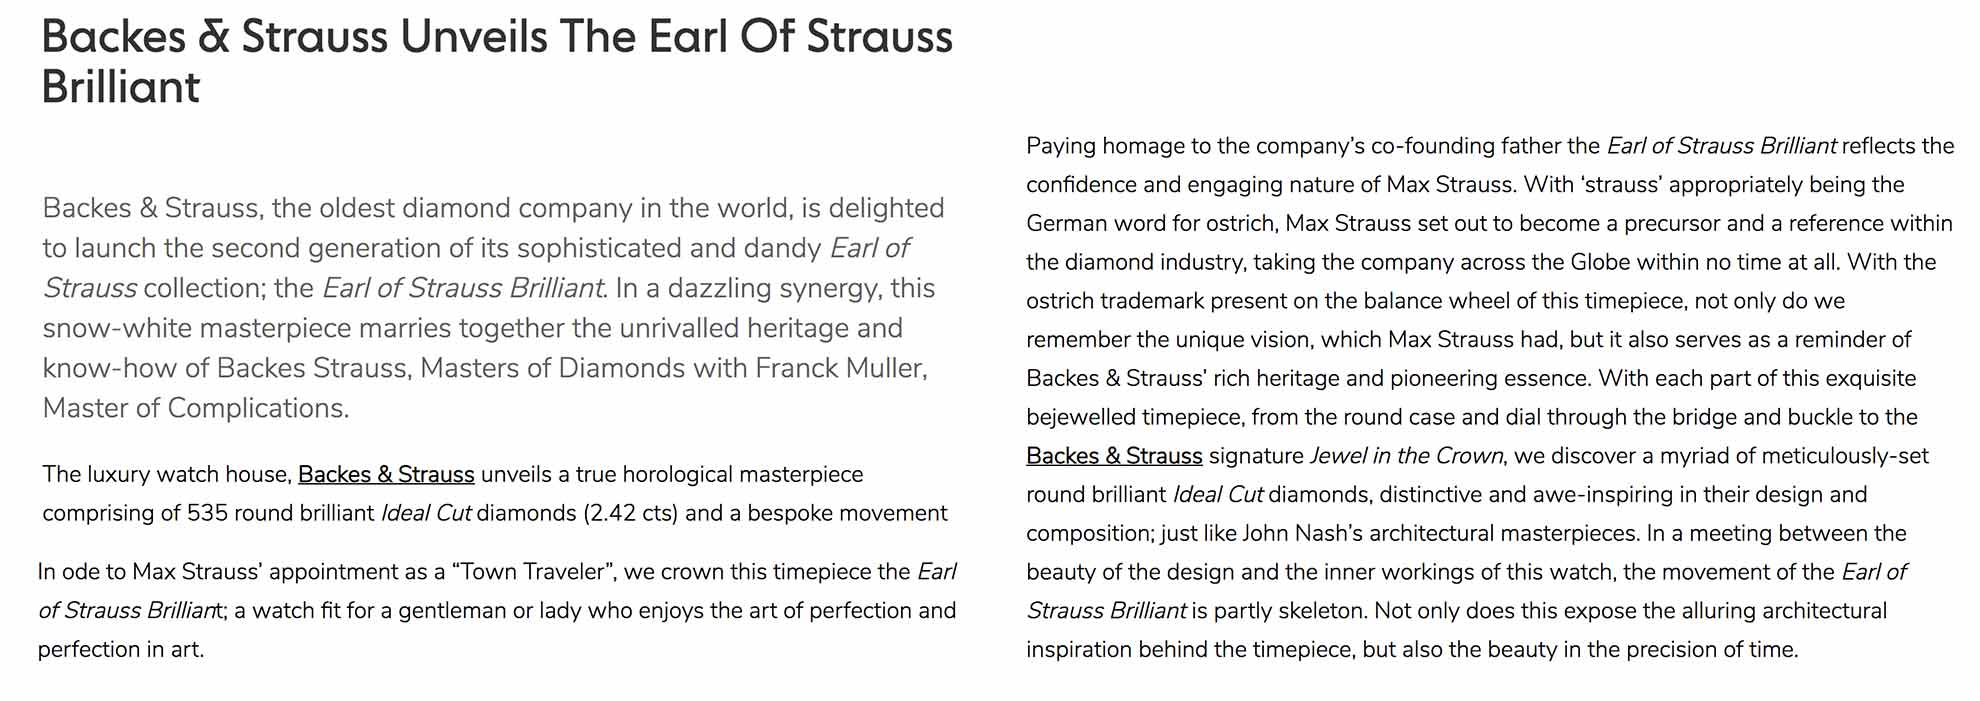 Earl of Strauss Brilliant ideal cut diamonds and bespoke watch